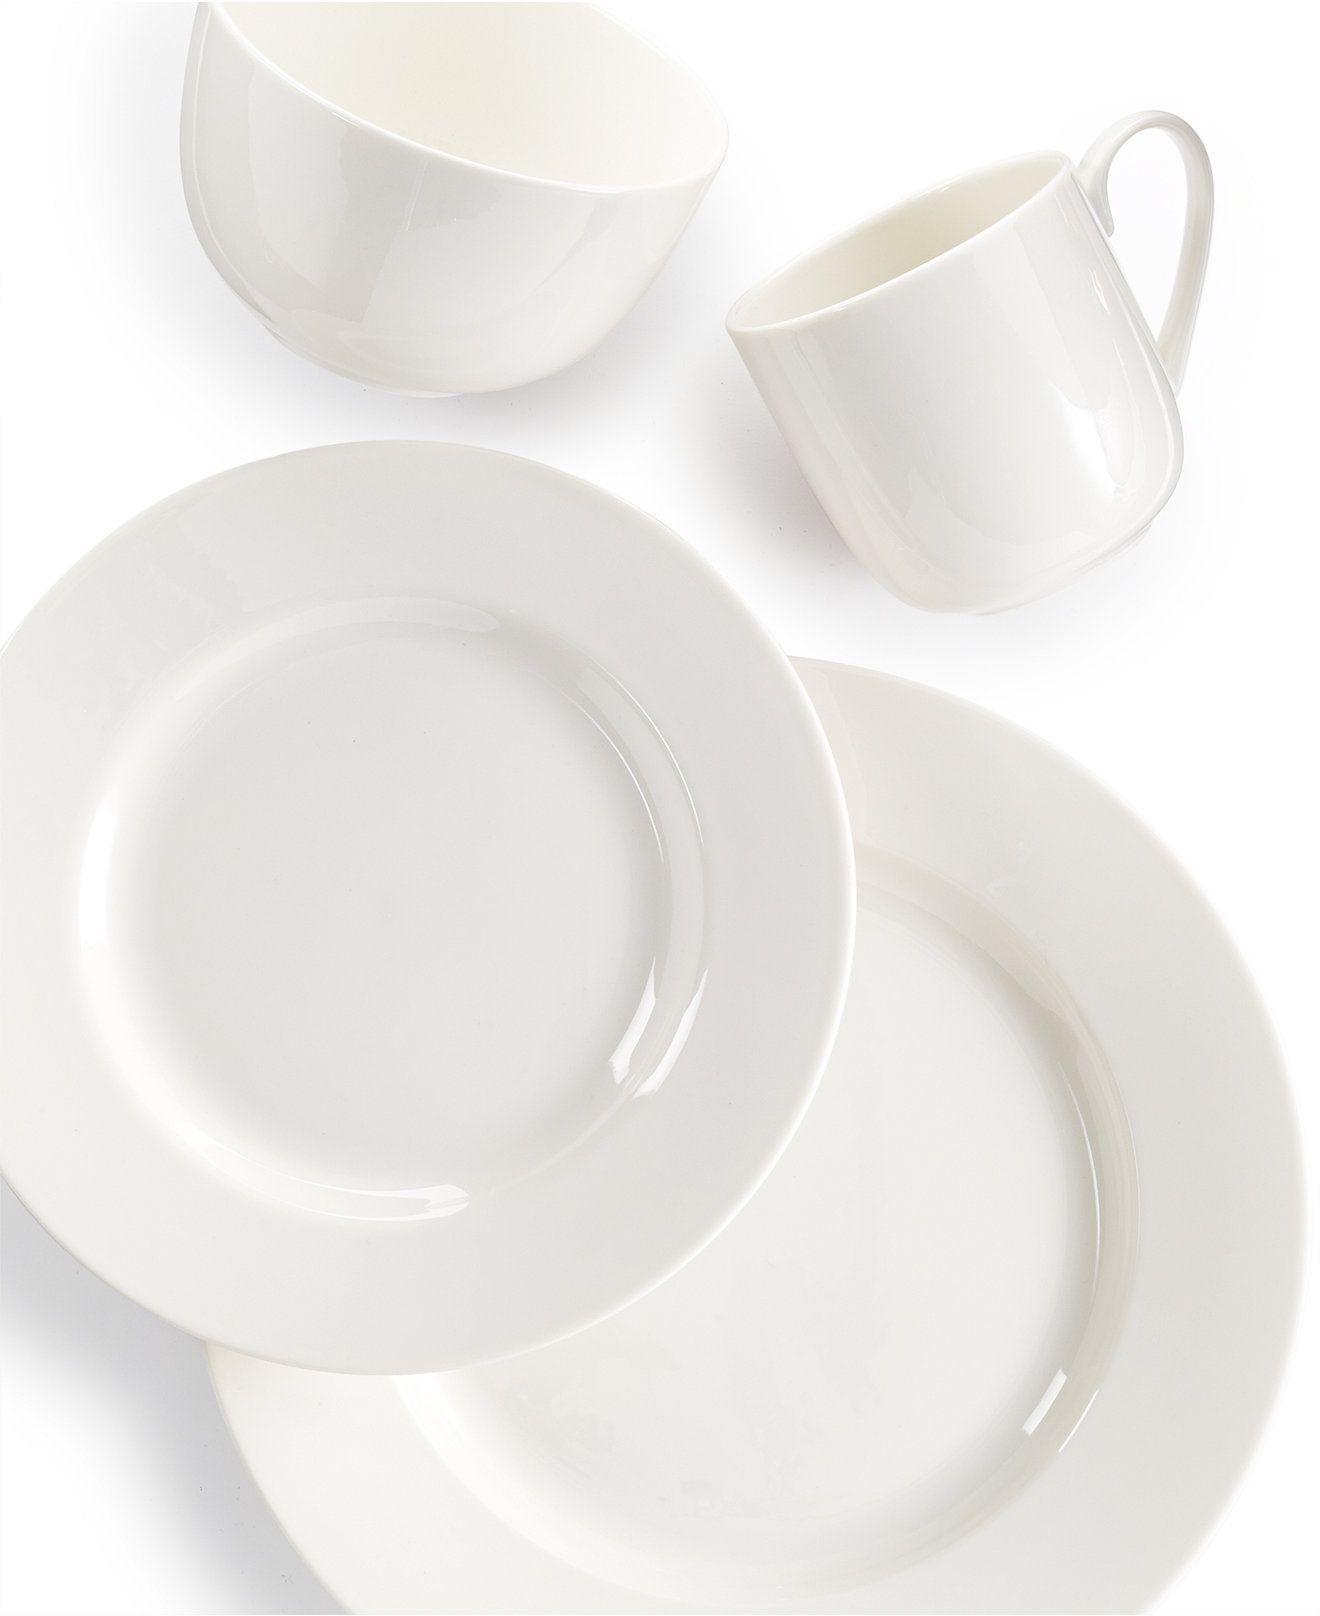 Martha Stewart Collection Kensington Whiteware Collection Casual